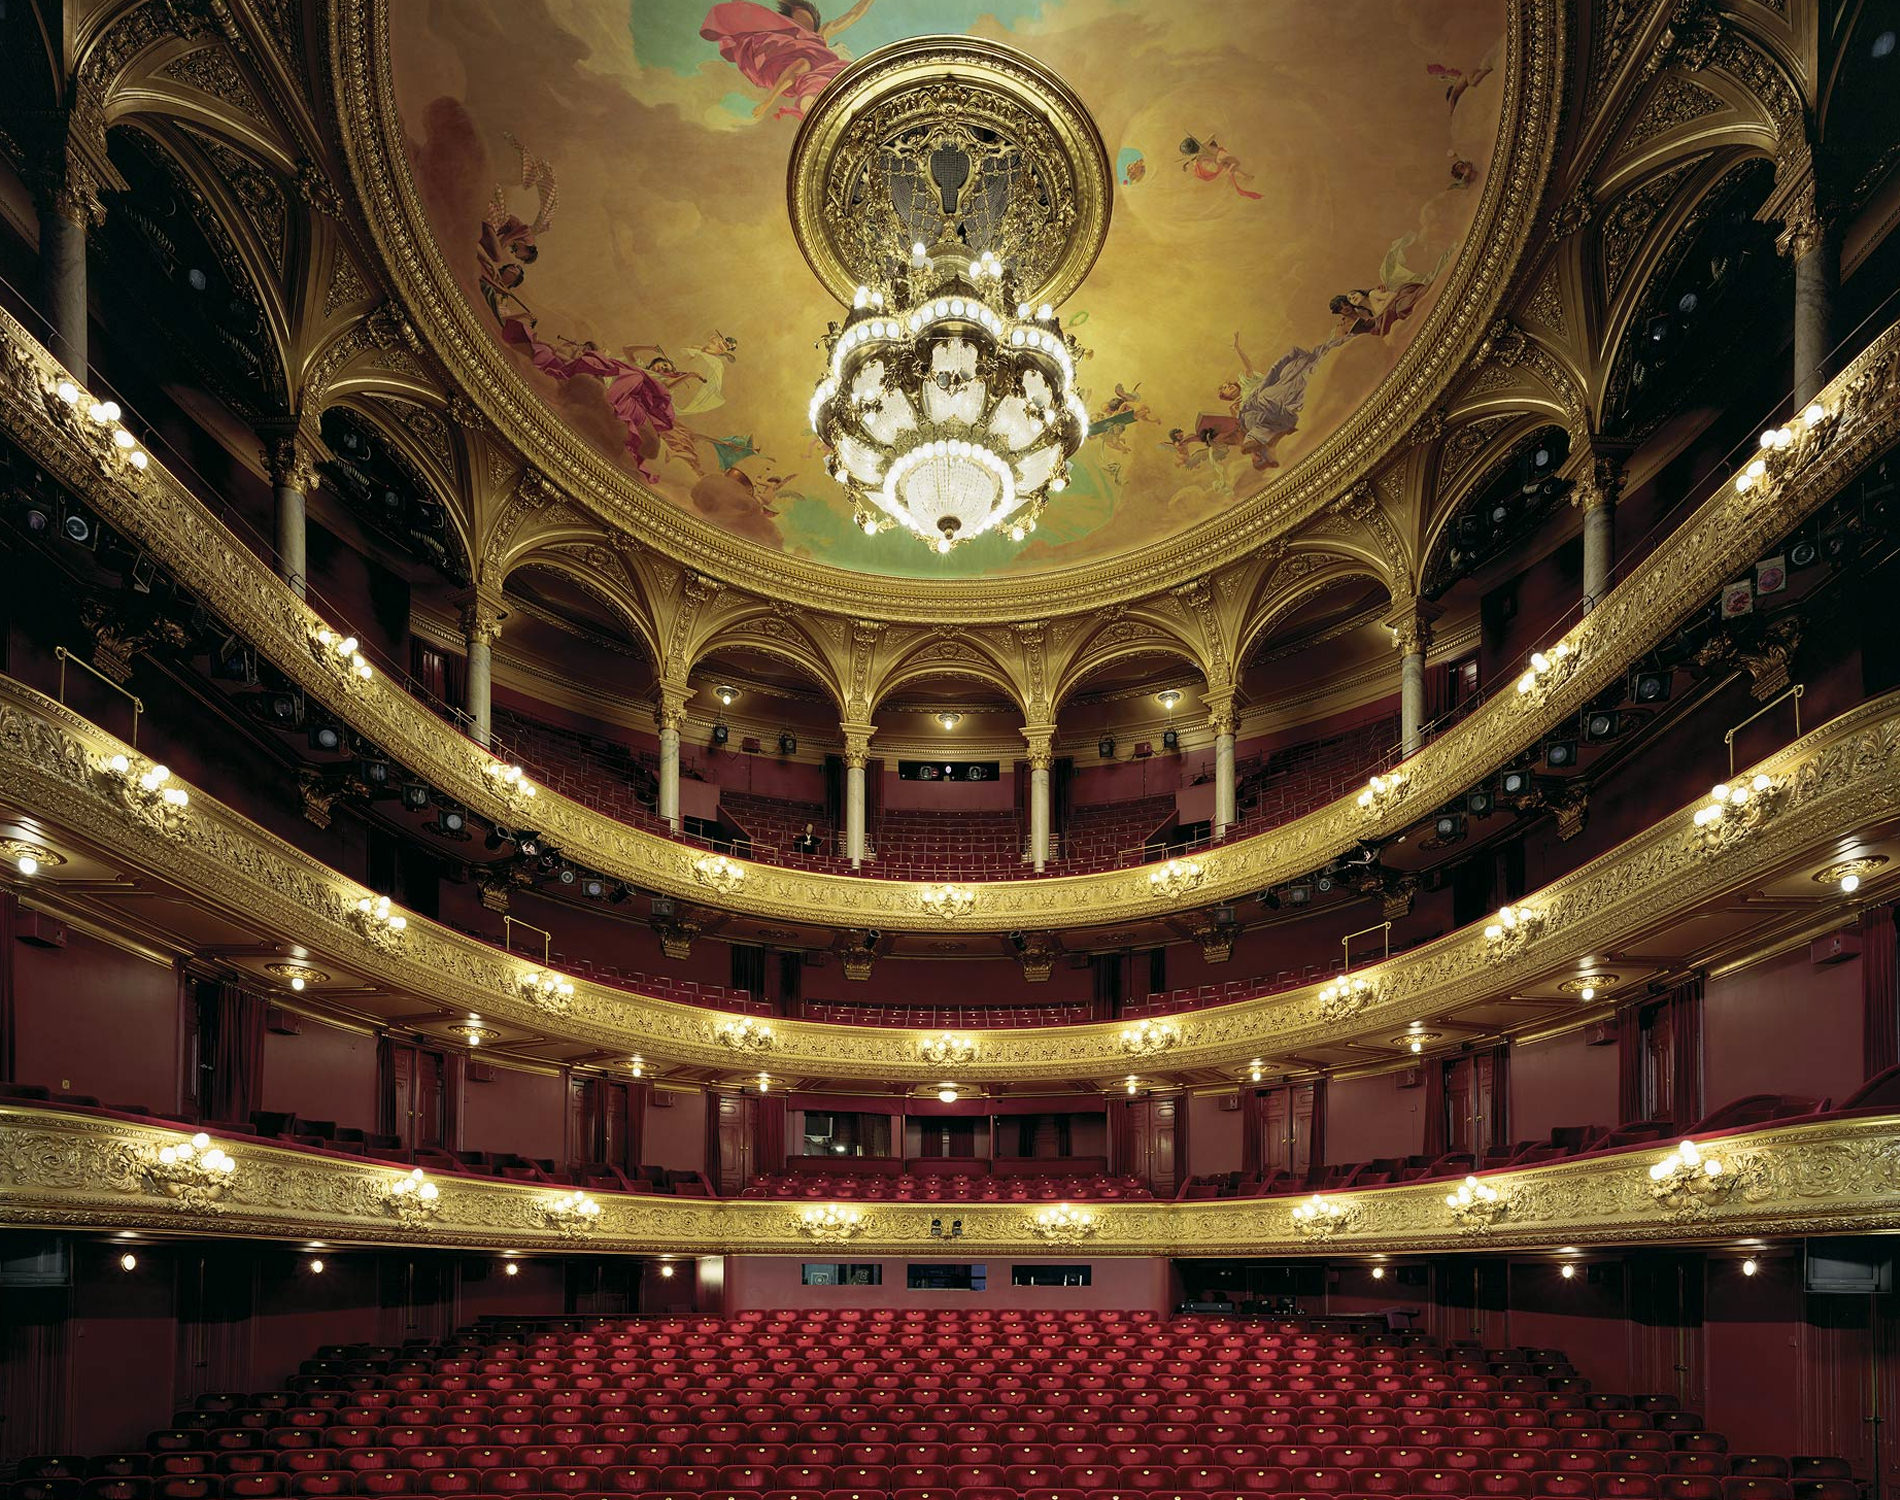 David Leventi Serie Photographie Opera Kungliga Operan Stockholm Suède 2008